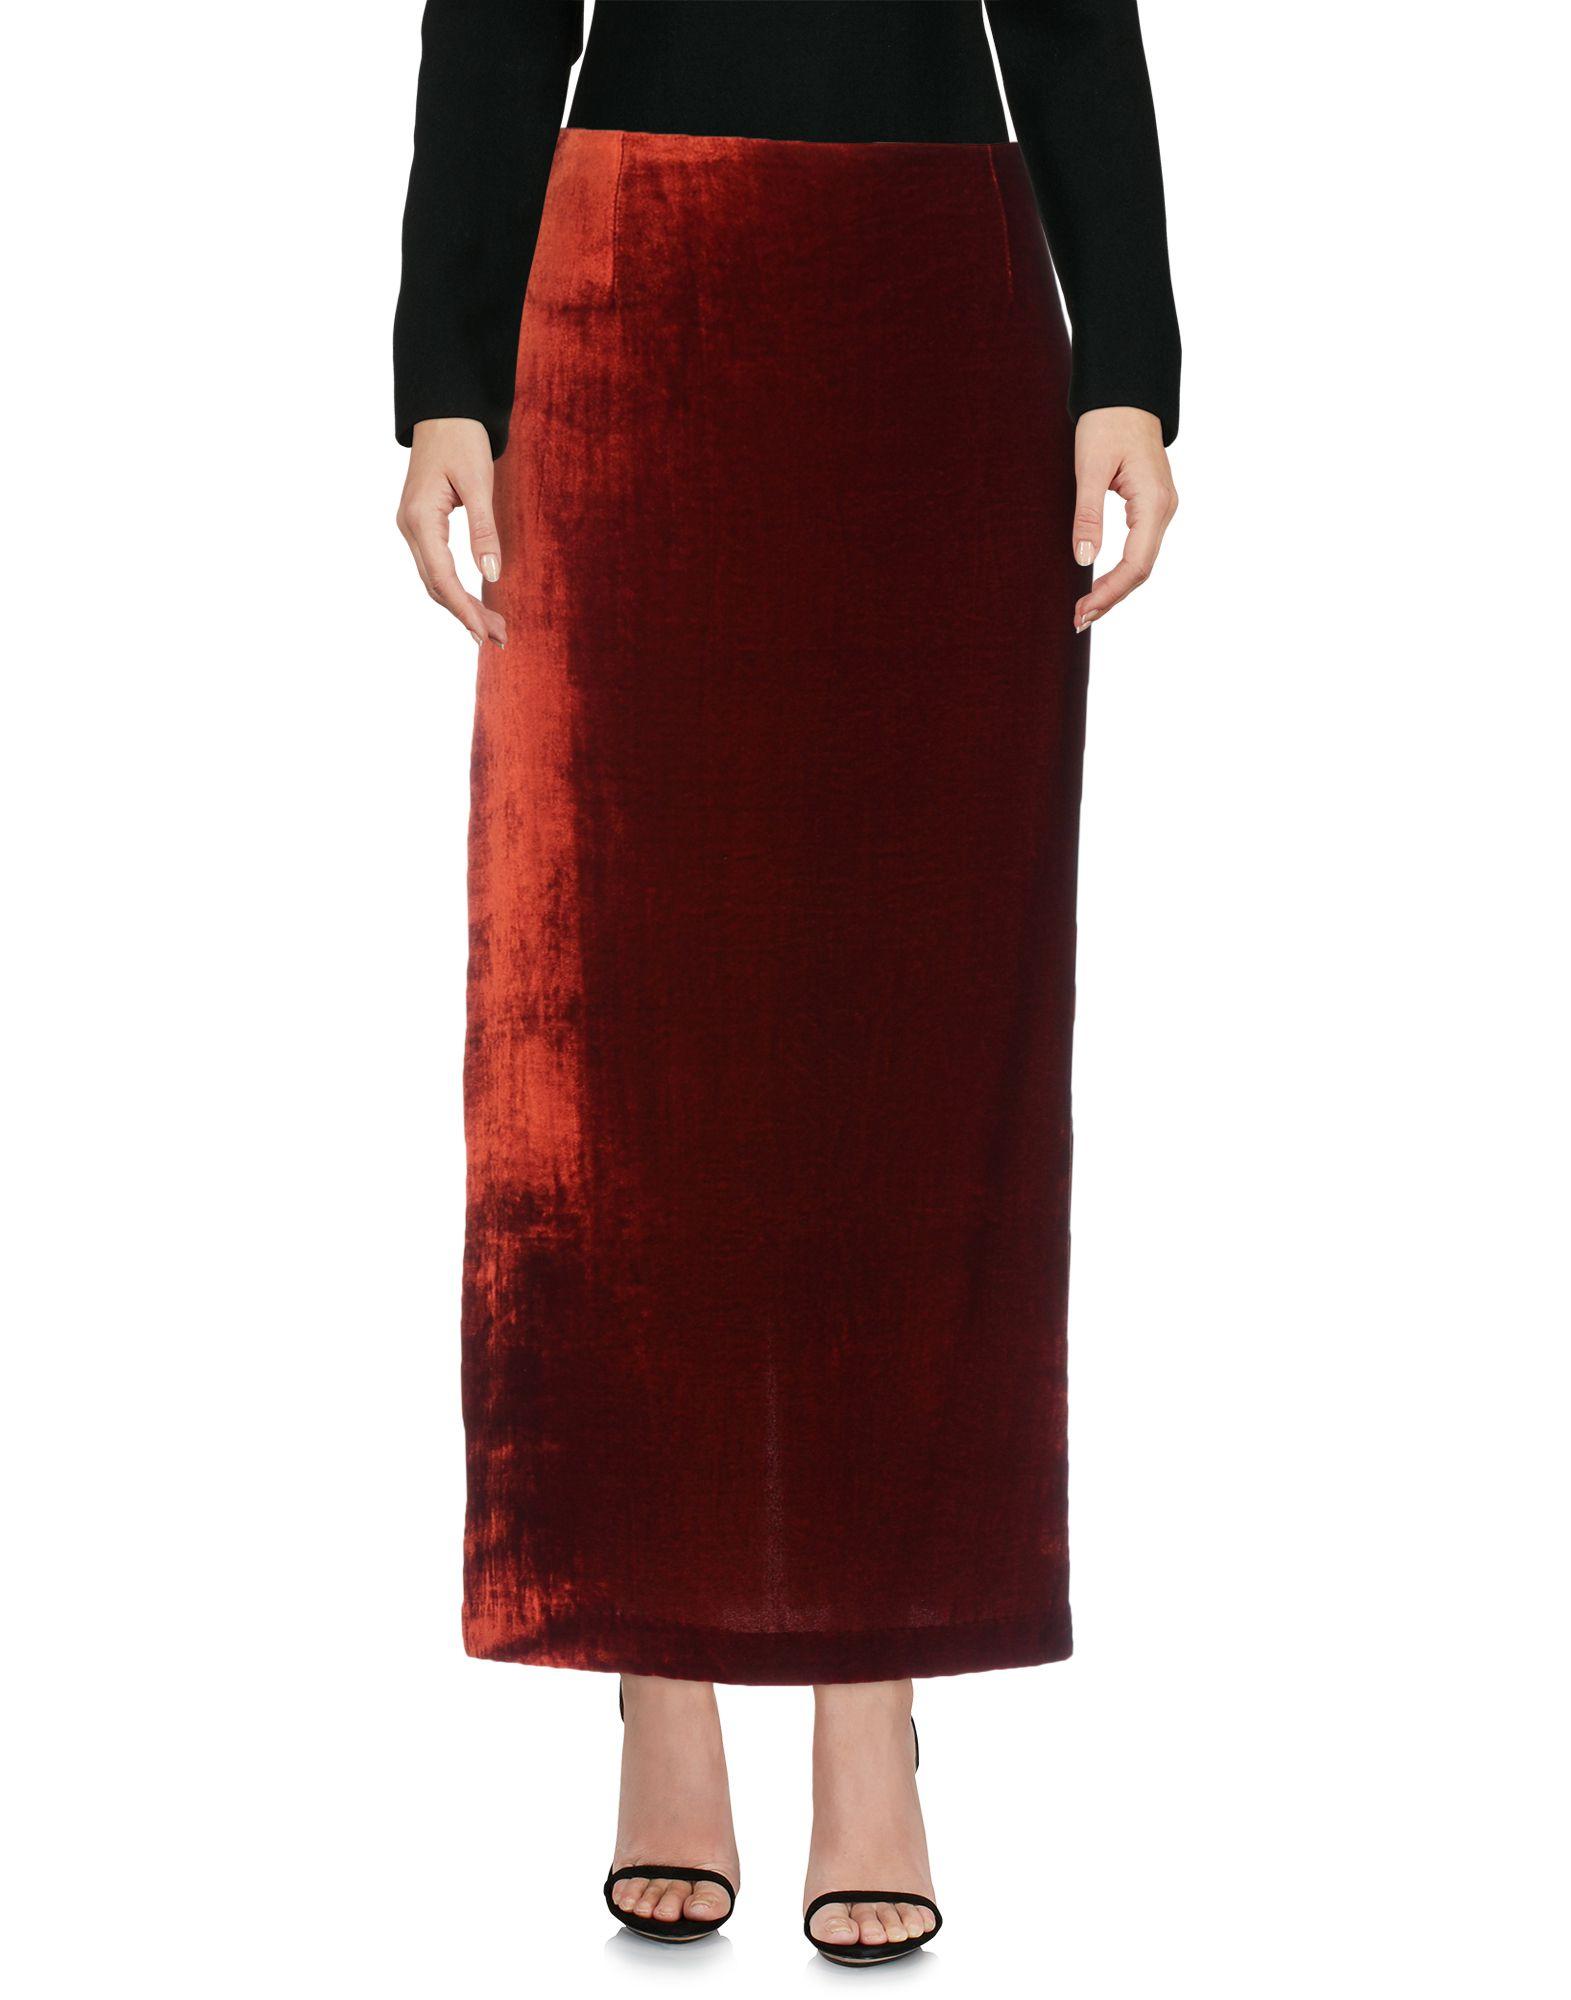 MAISON LAVINIATURRA Длинная юбка scaglione city длинная юбка